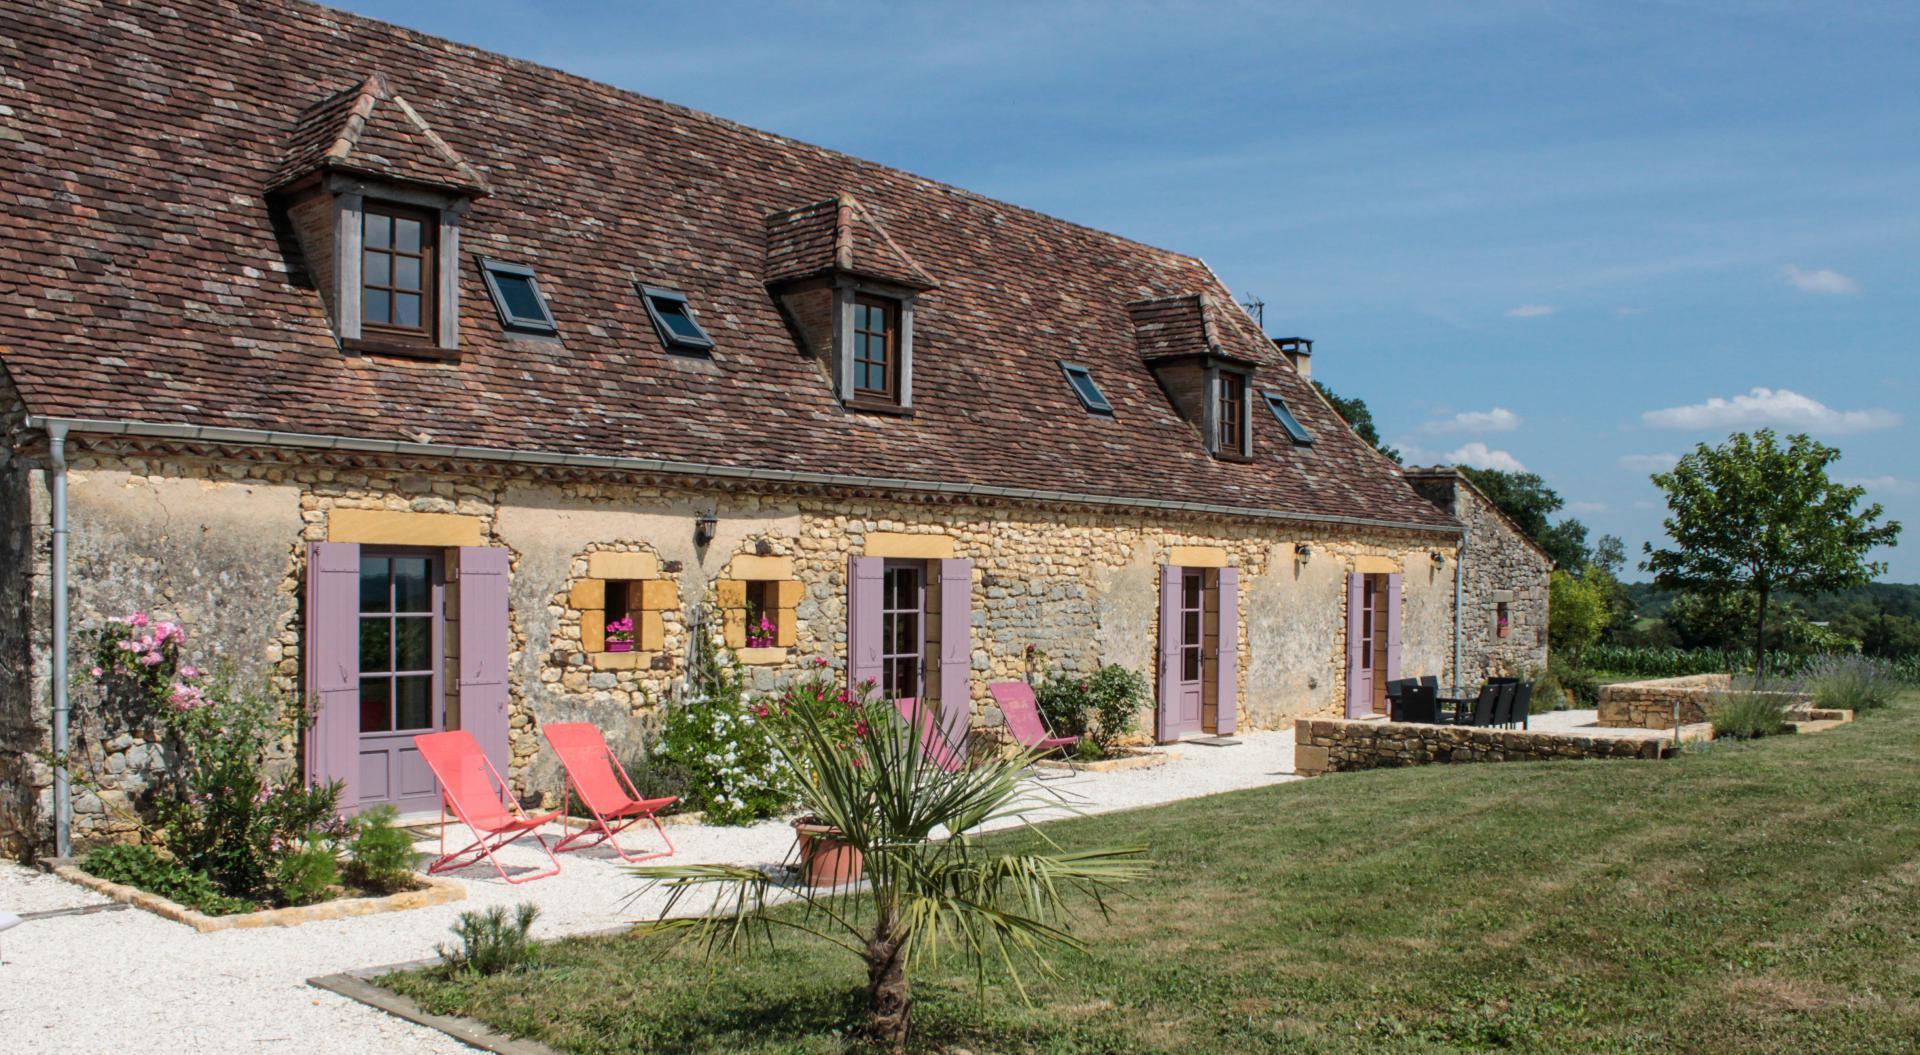 Gites ruraux Dordogne et Périgord